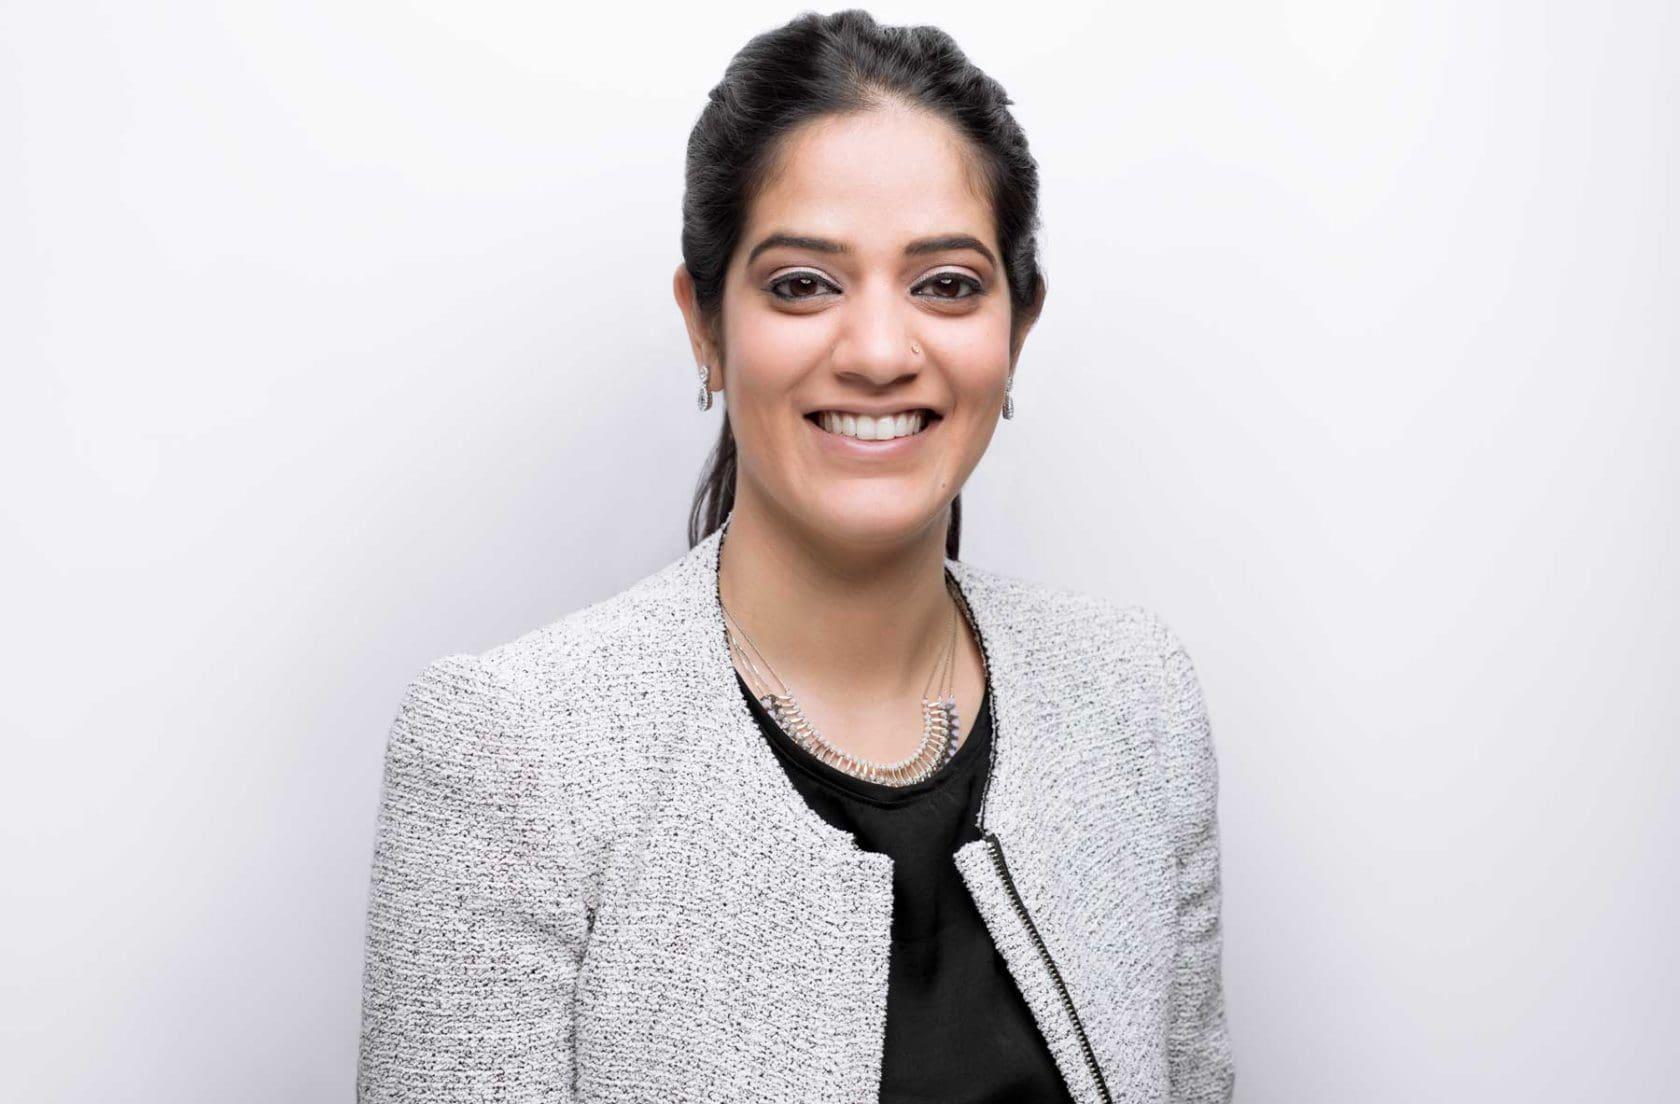 The Future is Female: Megha's 6 Tips for Women in Tech